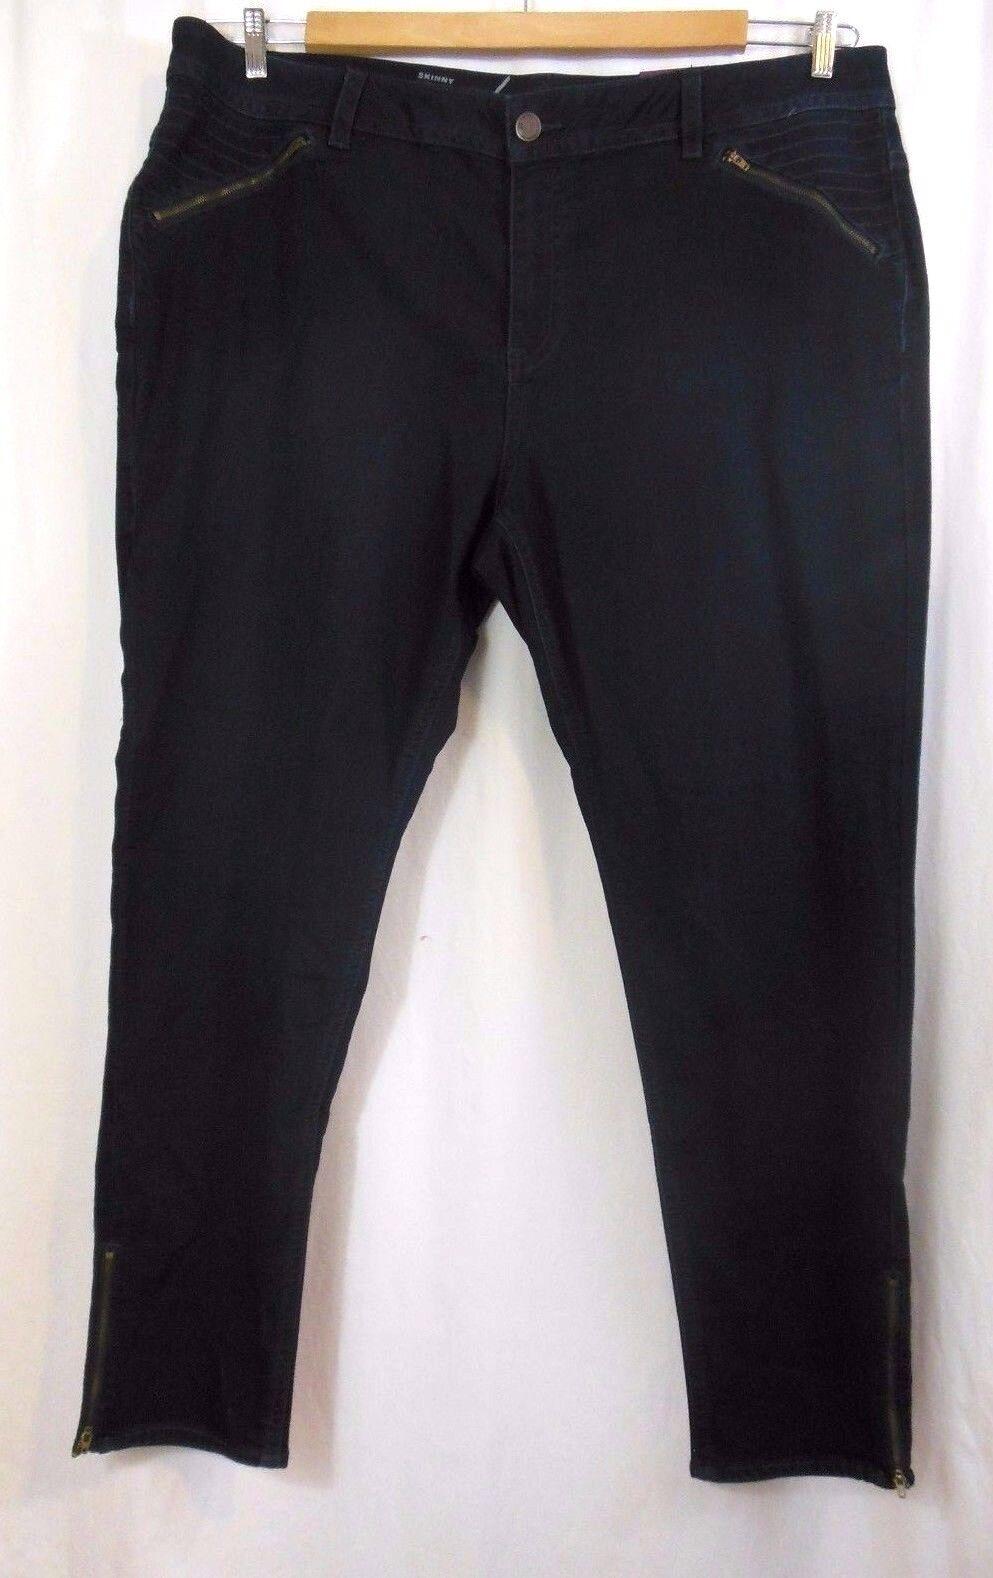 Lane Bryant Skinny Jeans 26 Stretch Dark Wash Ankle Side Zipper Detail NEW NWT